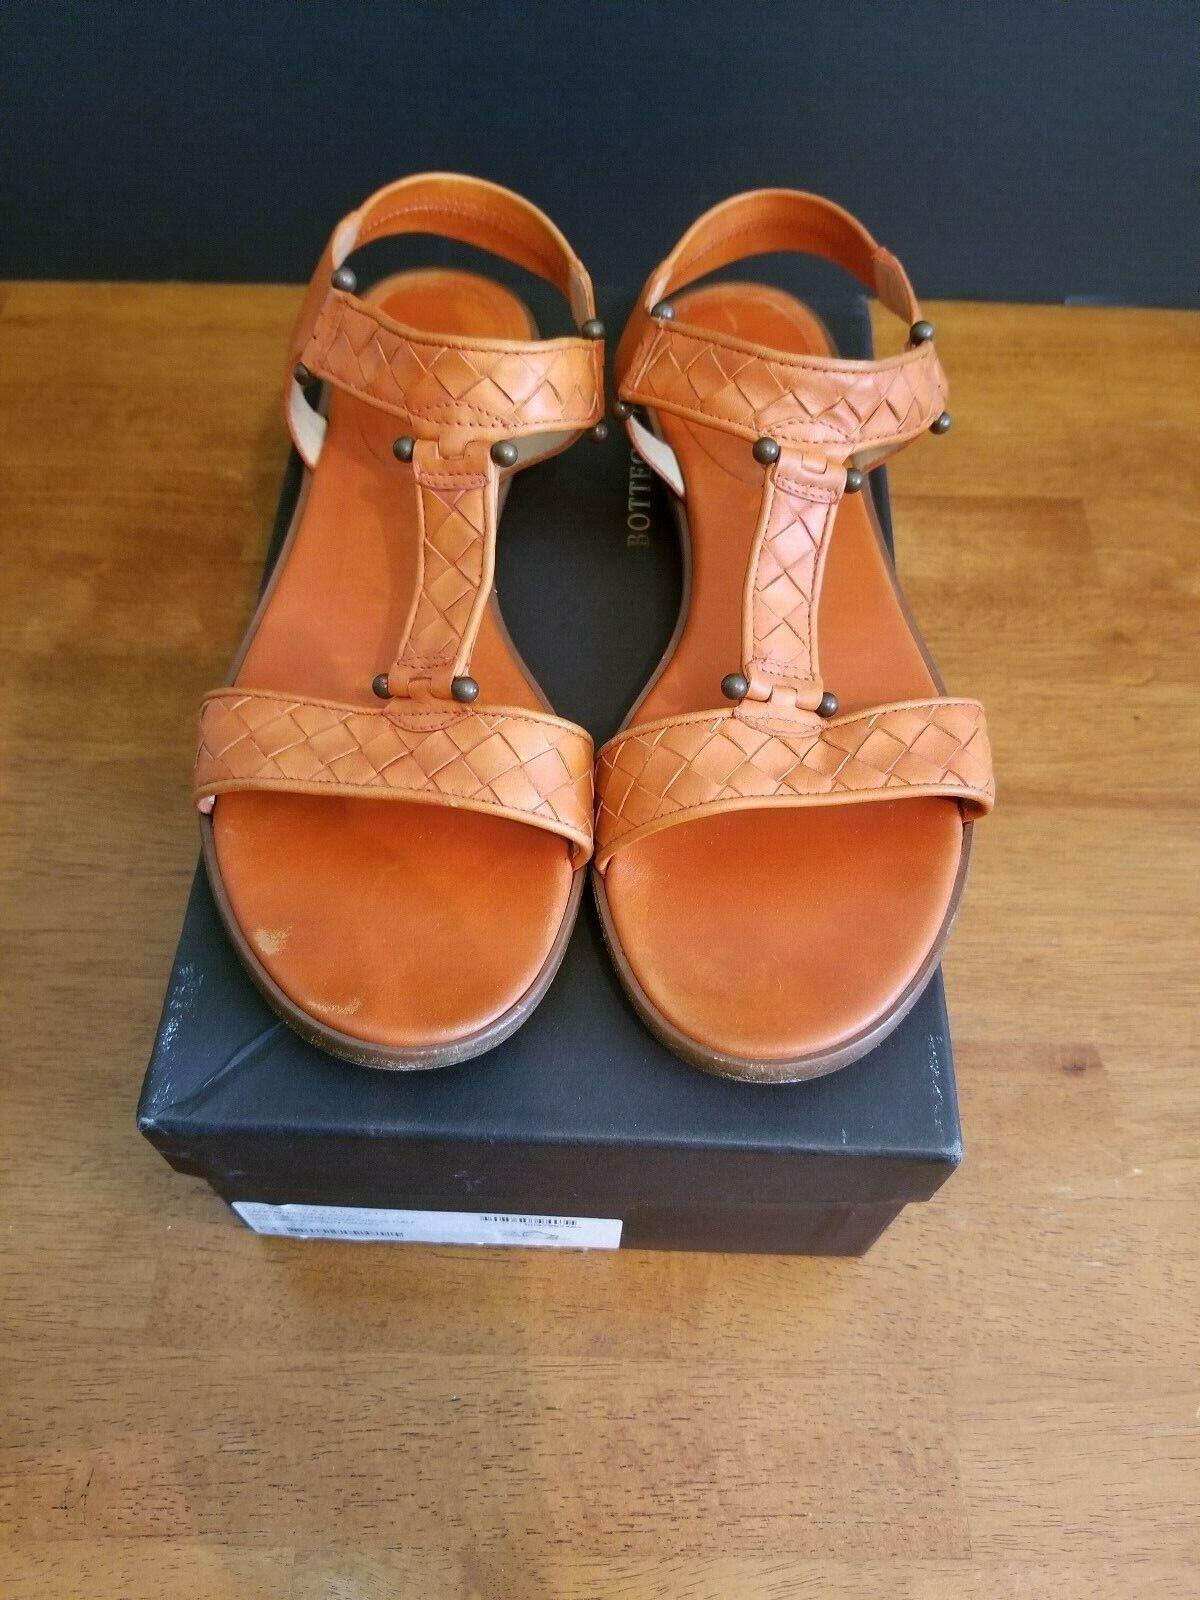 Bottega VENETA Intrecciato Cuero Marrón Zapatos Sandalias planas tamaño 8 - 8.5 Excelente